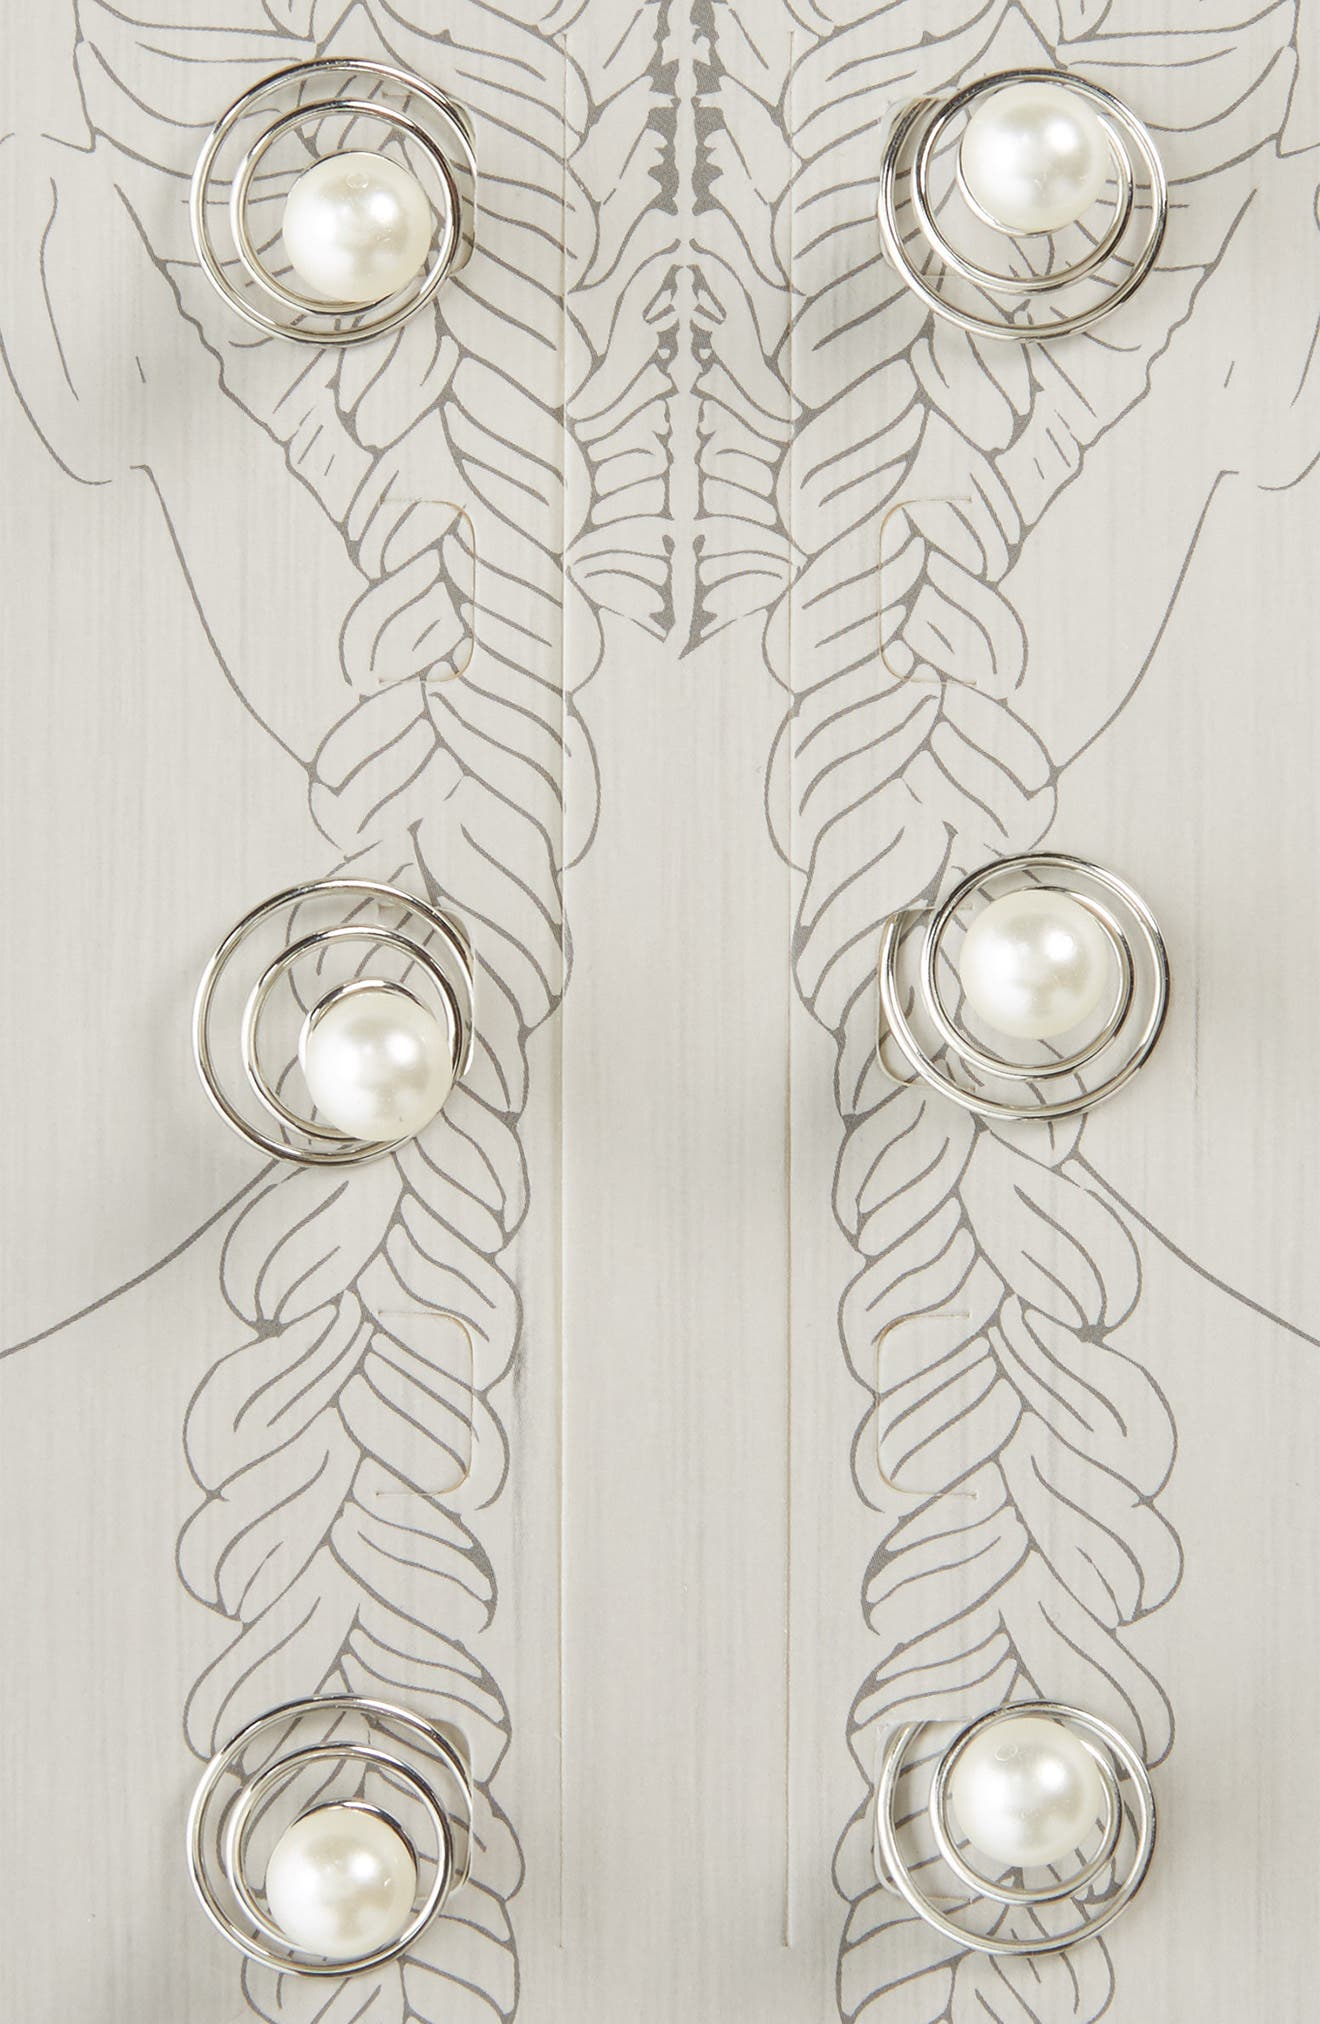 Set of 6 Imitation Pearl Swirl Rings,                             Alternate thumbnail 2, color,                             Ivory